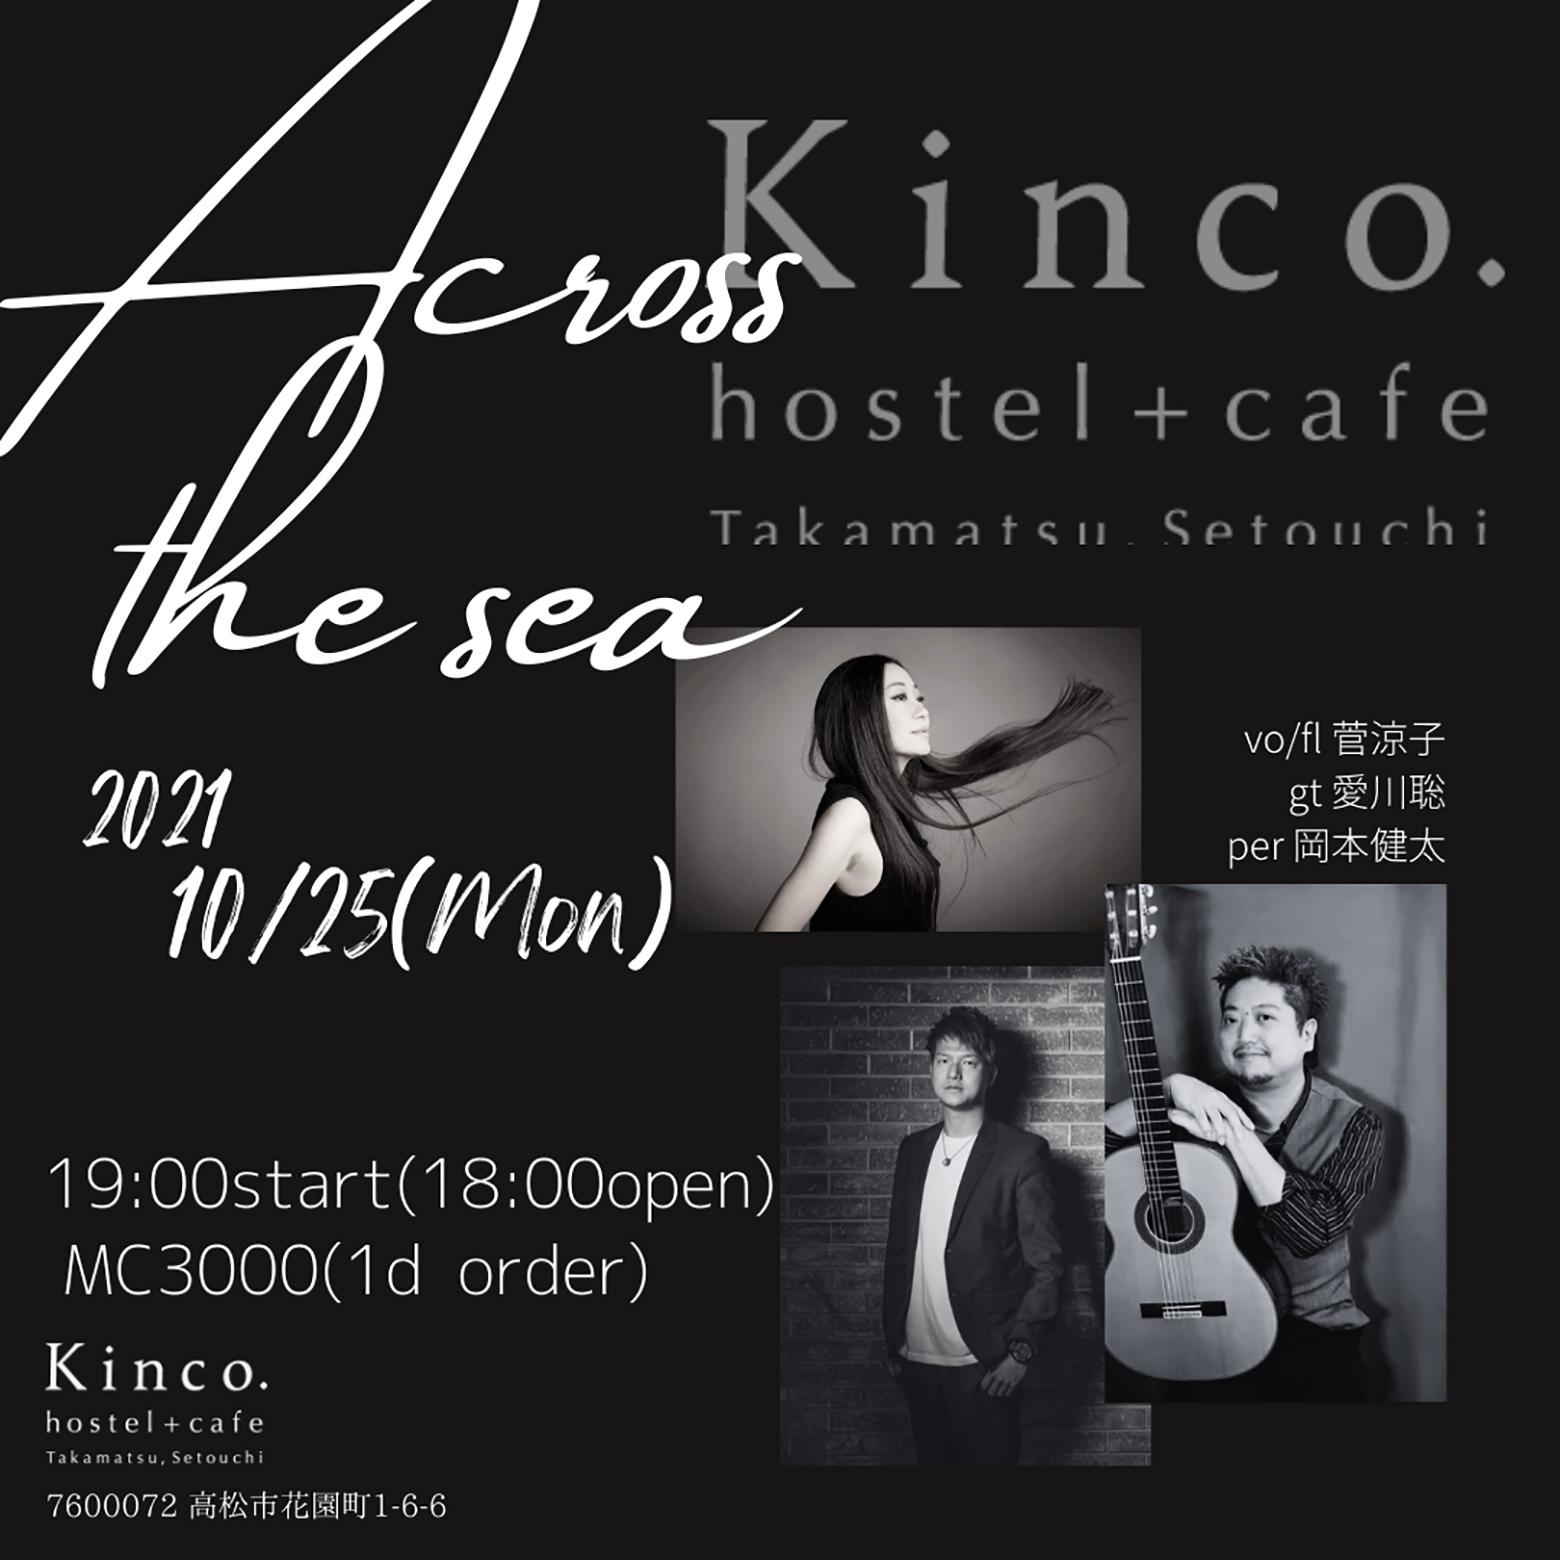 Jazz Live「Across the sea」- 高松市のカフェ+ゲストハウス Kinco.